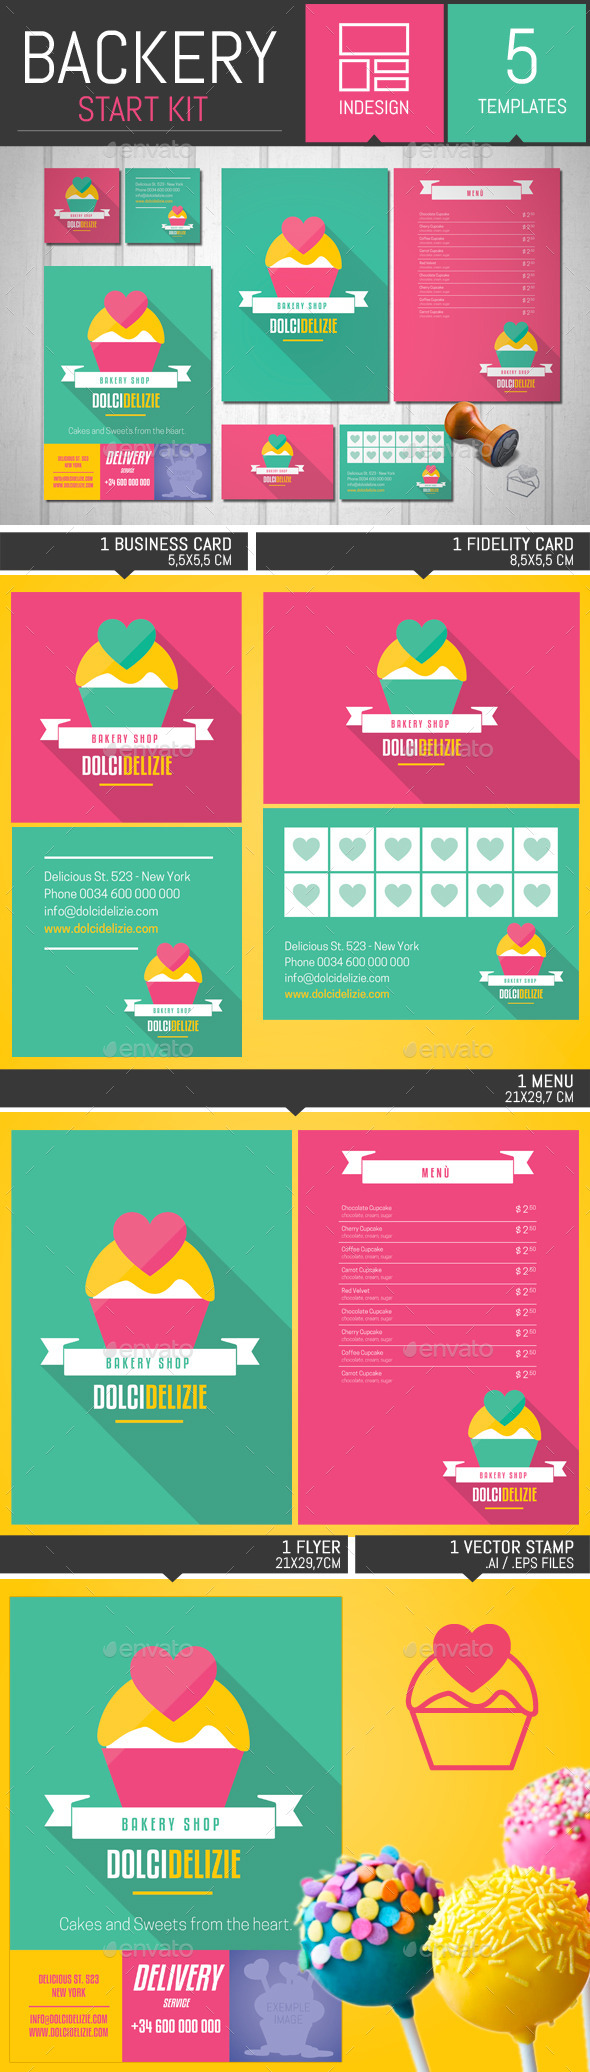 Material Design Bakery Start Kit Template - Stationery Print Templates